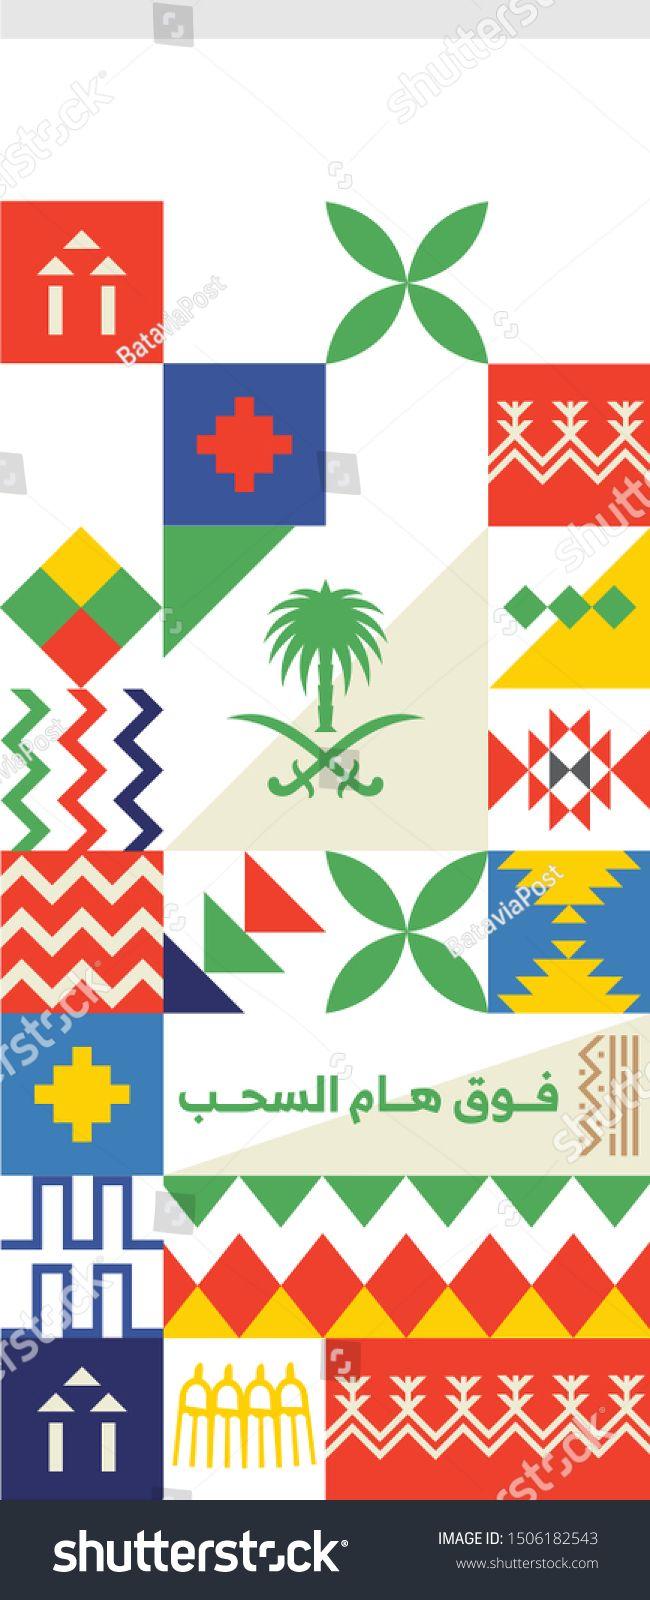 Riyadh Ksa September 23rd 2019 Saudi National Day Official Logo Saudi Arabian Traditional M Social Media Design Graphics National Day Social Media Design